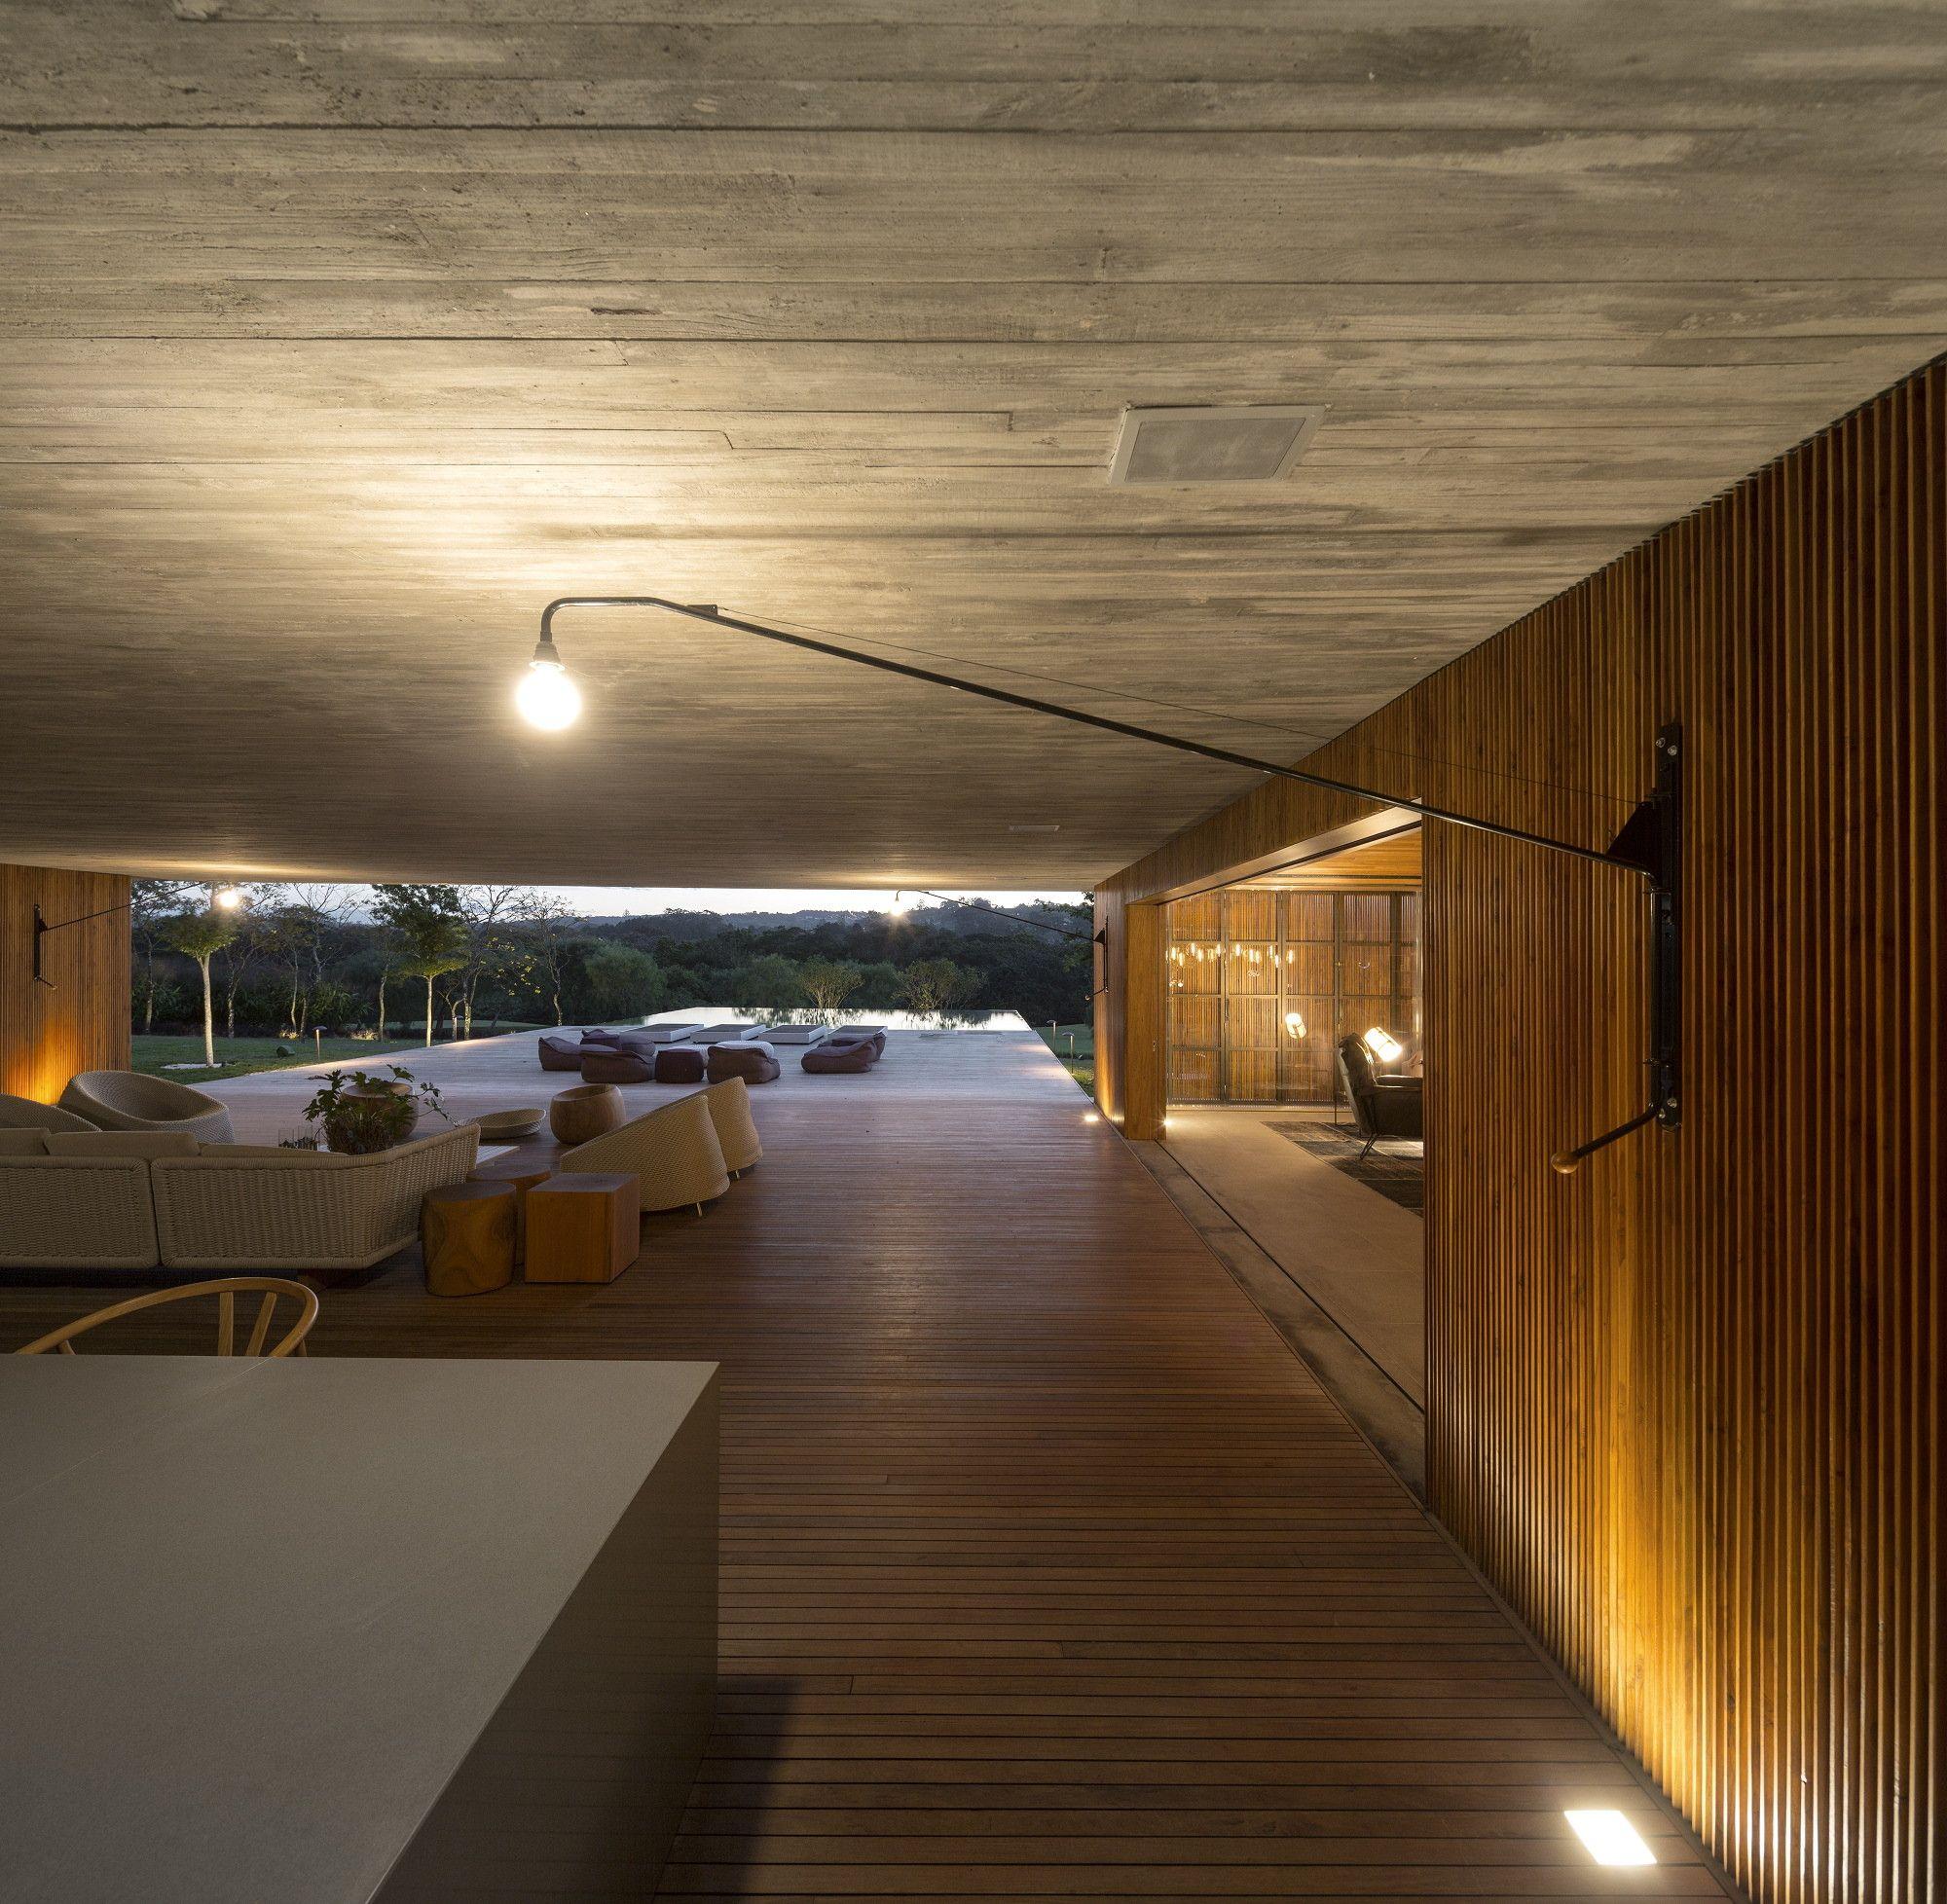 Galeria de MM House / Studio MK27 Marcio Kogan + Maria